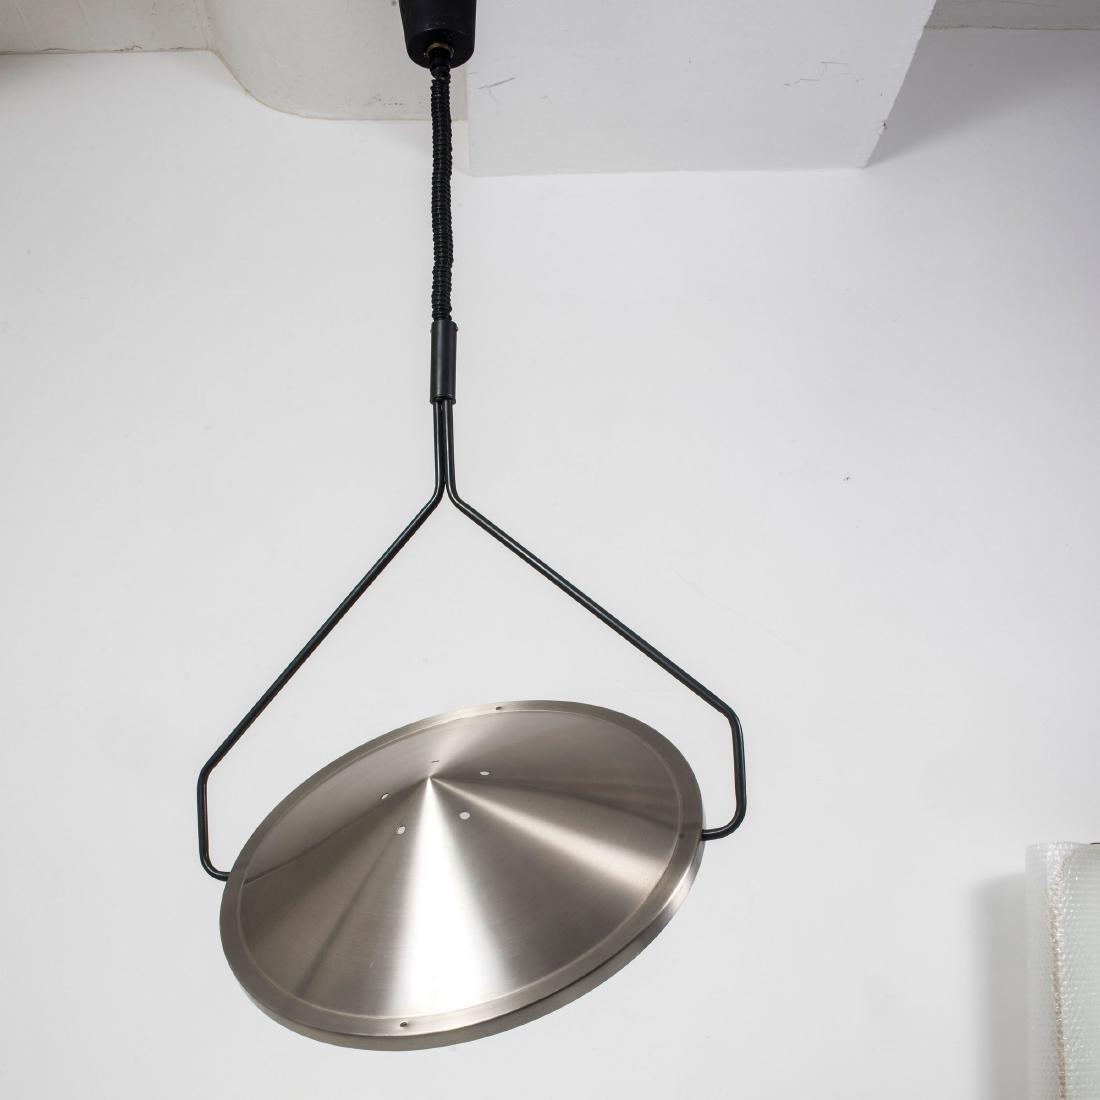 'Cardan' ceiling light, c. 1970 - 2